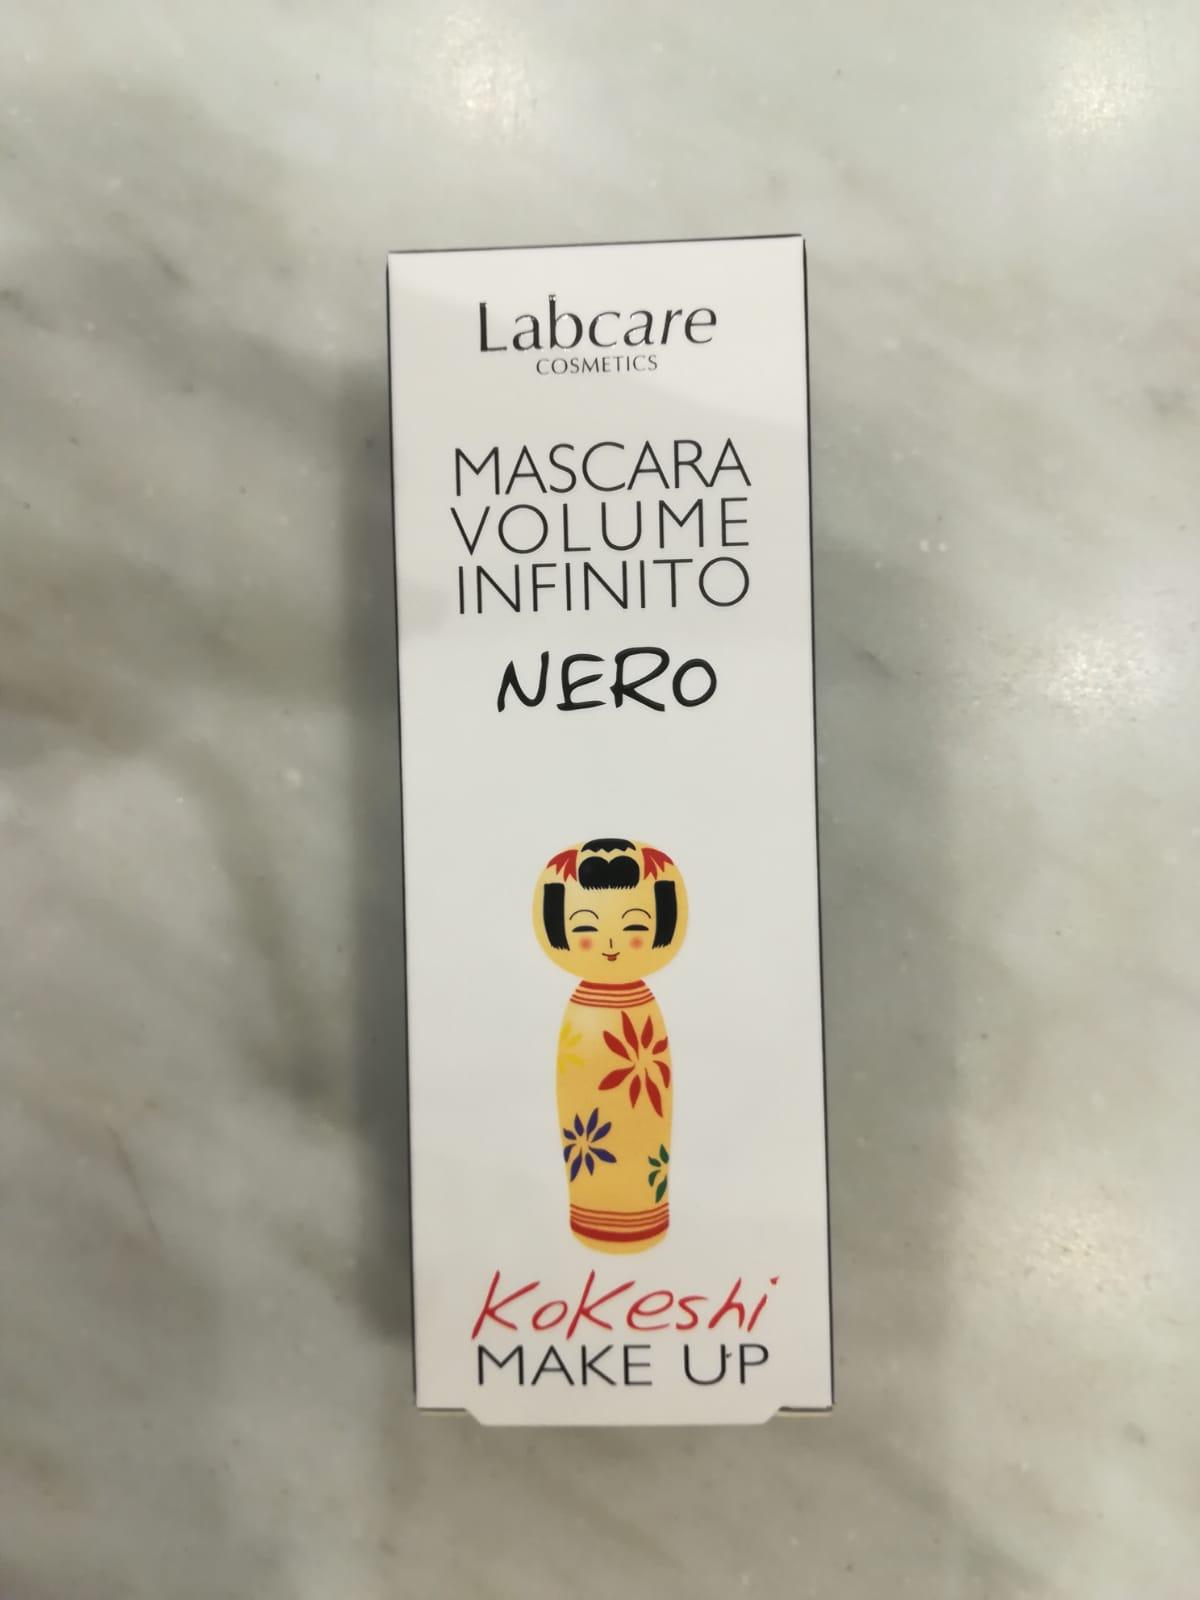 LABCARE MASCARA VOLUME INFINITO NERO 10 ml